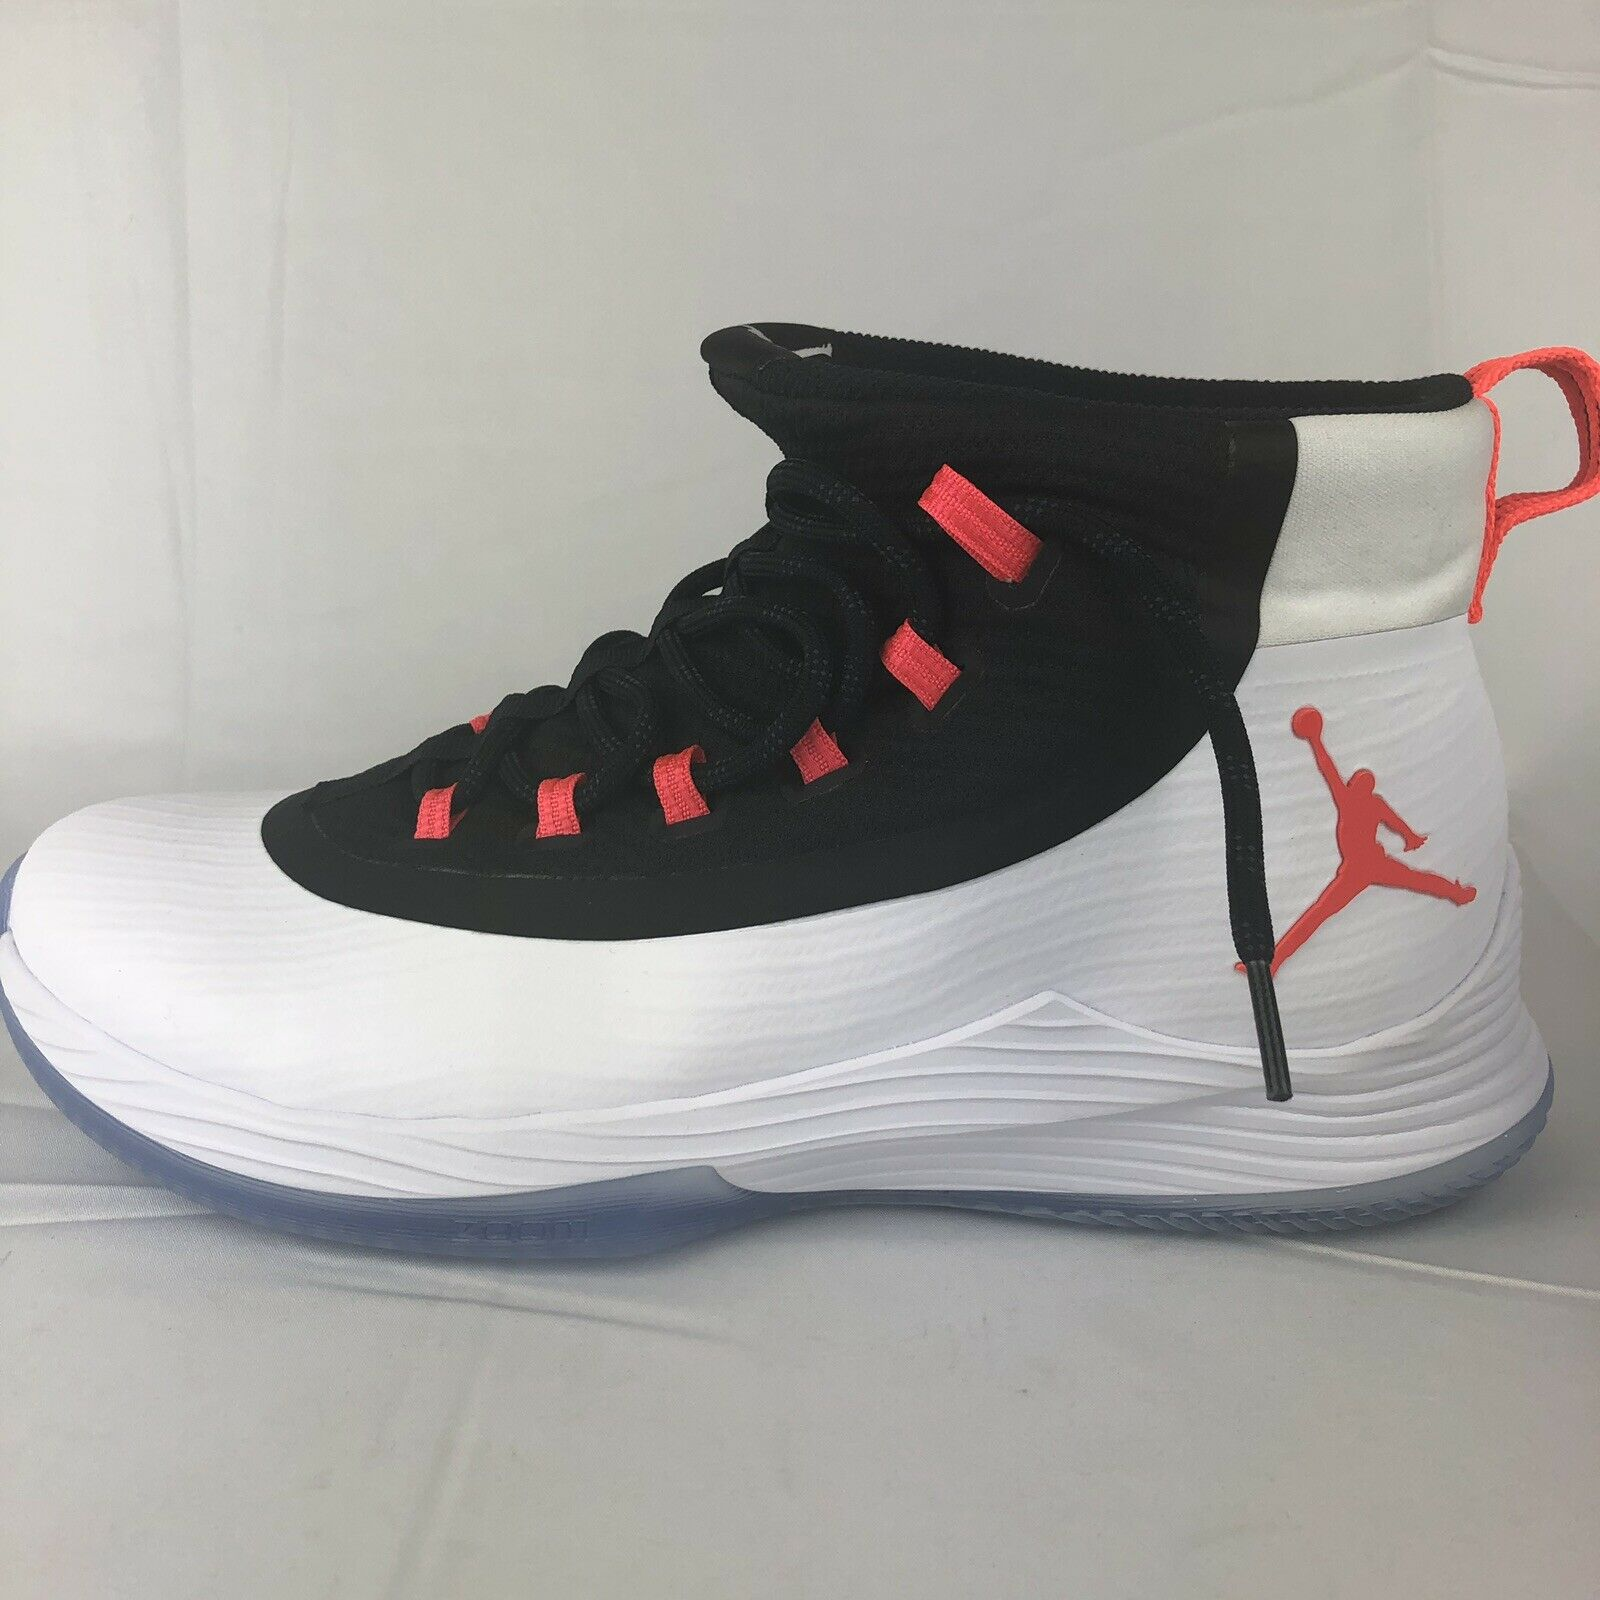 new style ddda8 555ba Nike Air Air Air Jordan Ultra Fly 2 Infrared Basketball shoes 897998-123  Men s 10.5